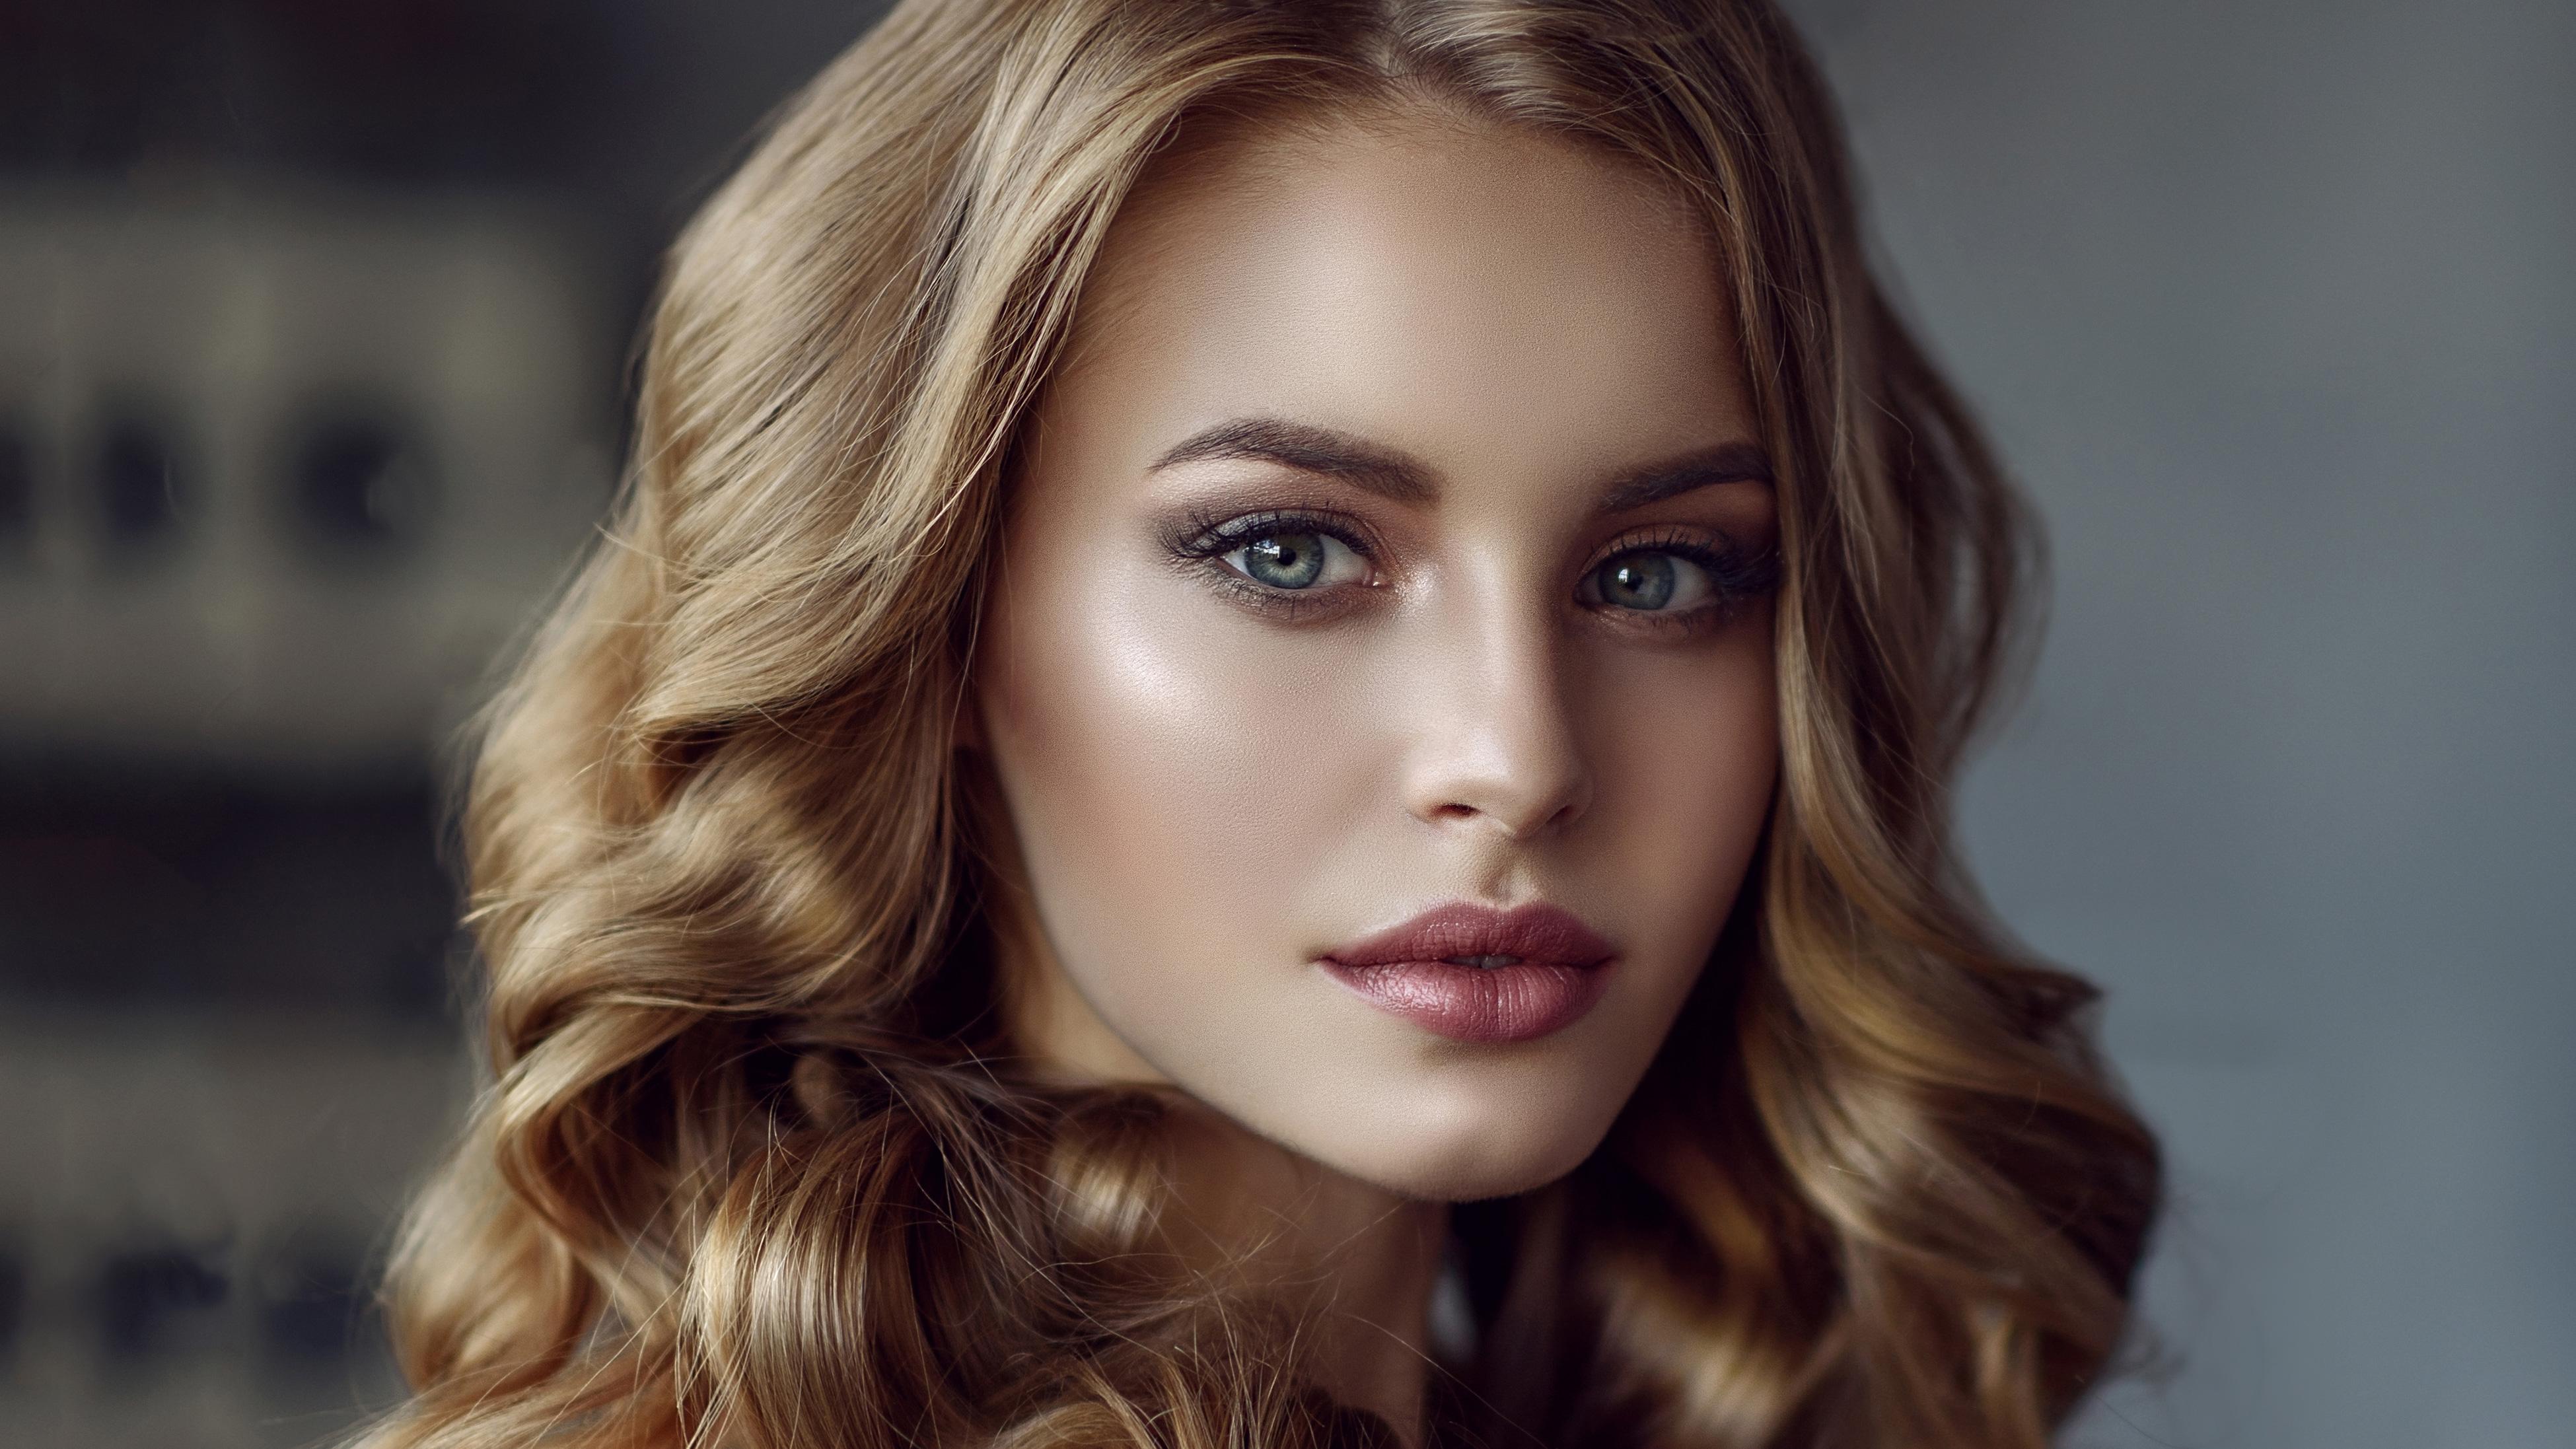 beautiful face blonde girl 1575664532 - Beautiful Face Blonde Girl -